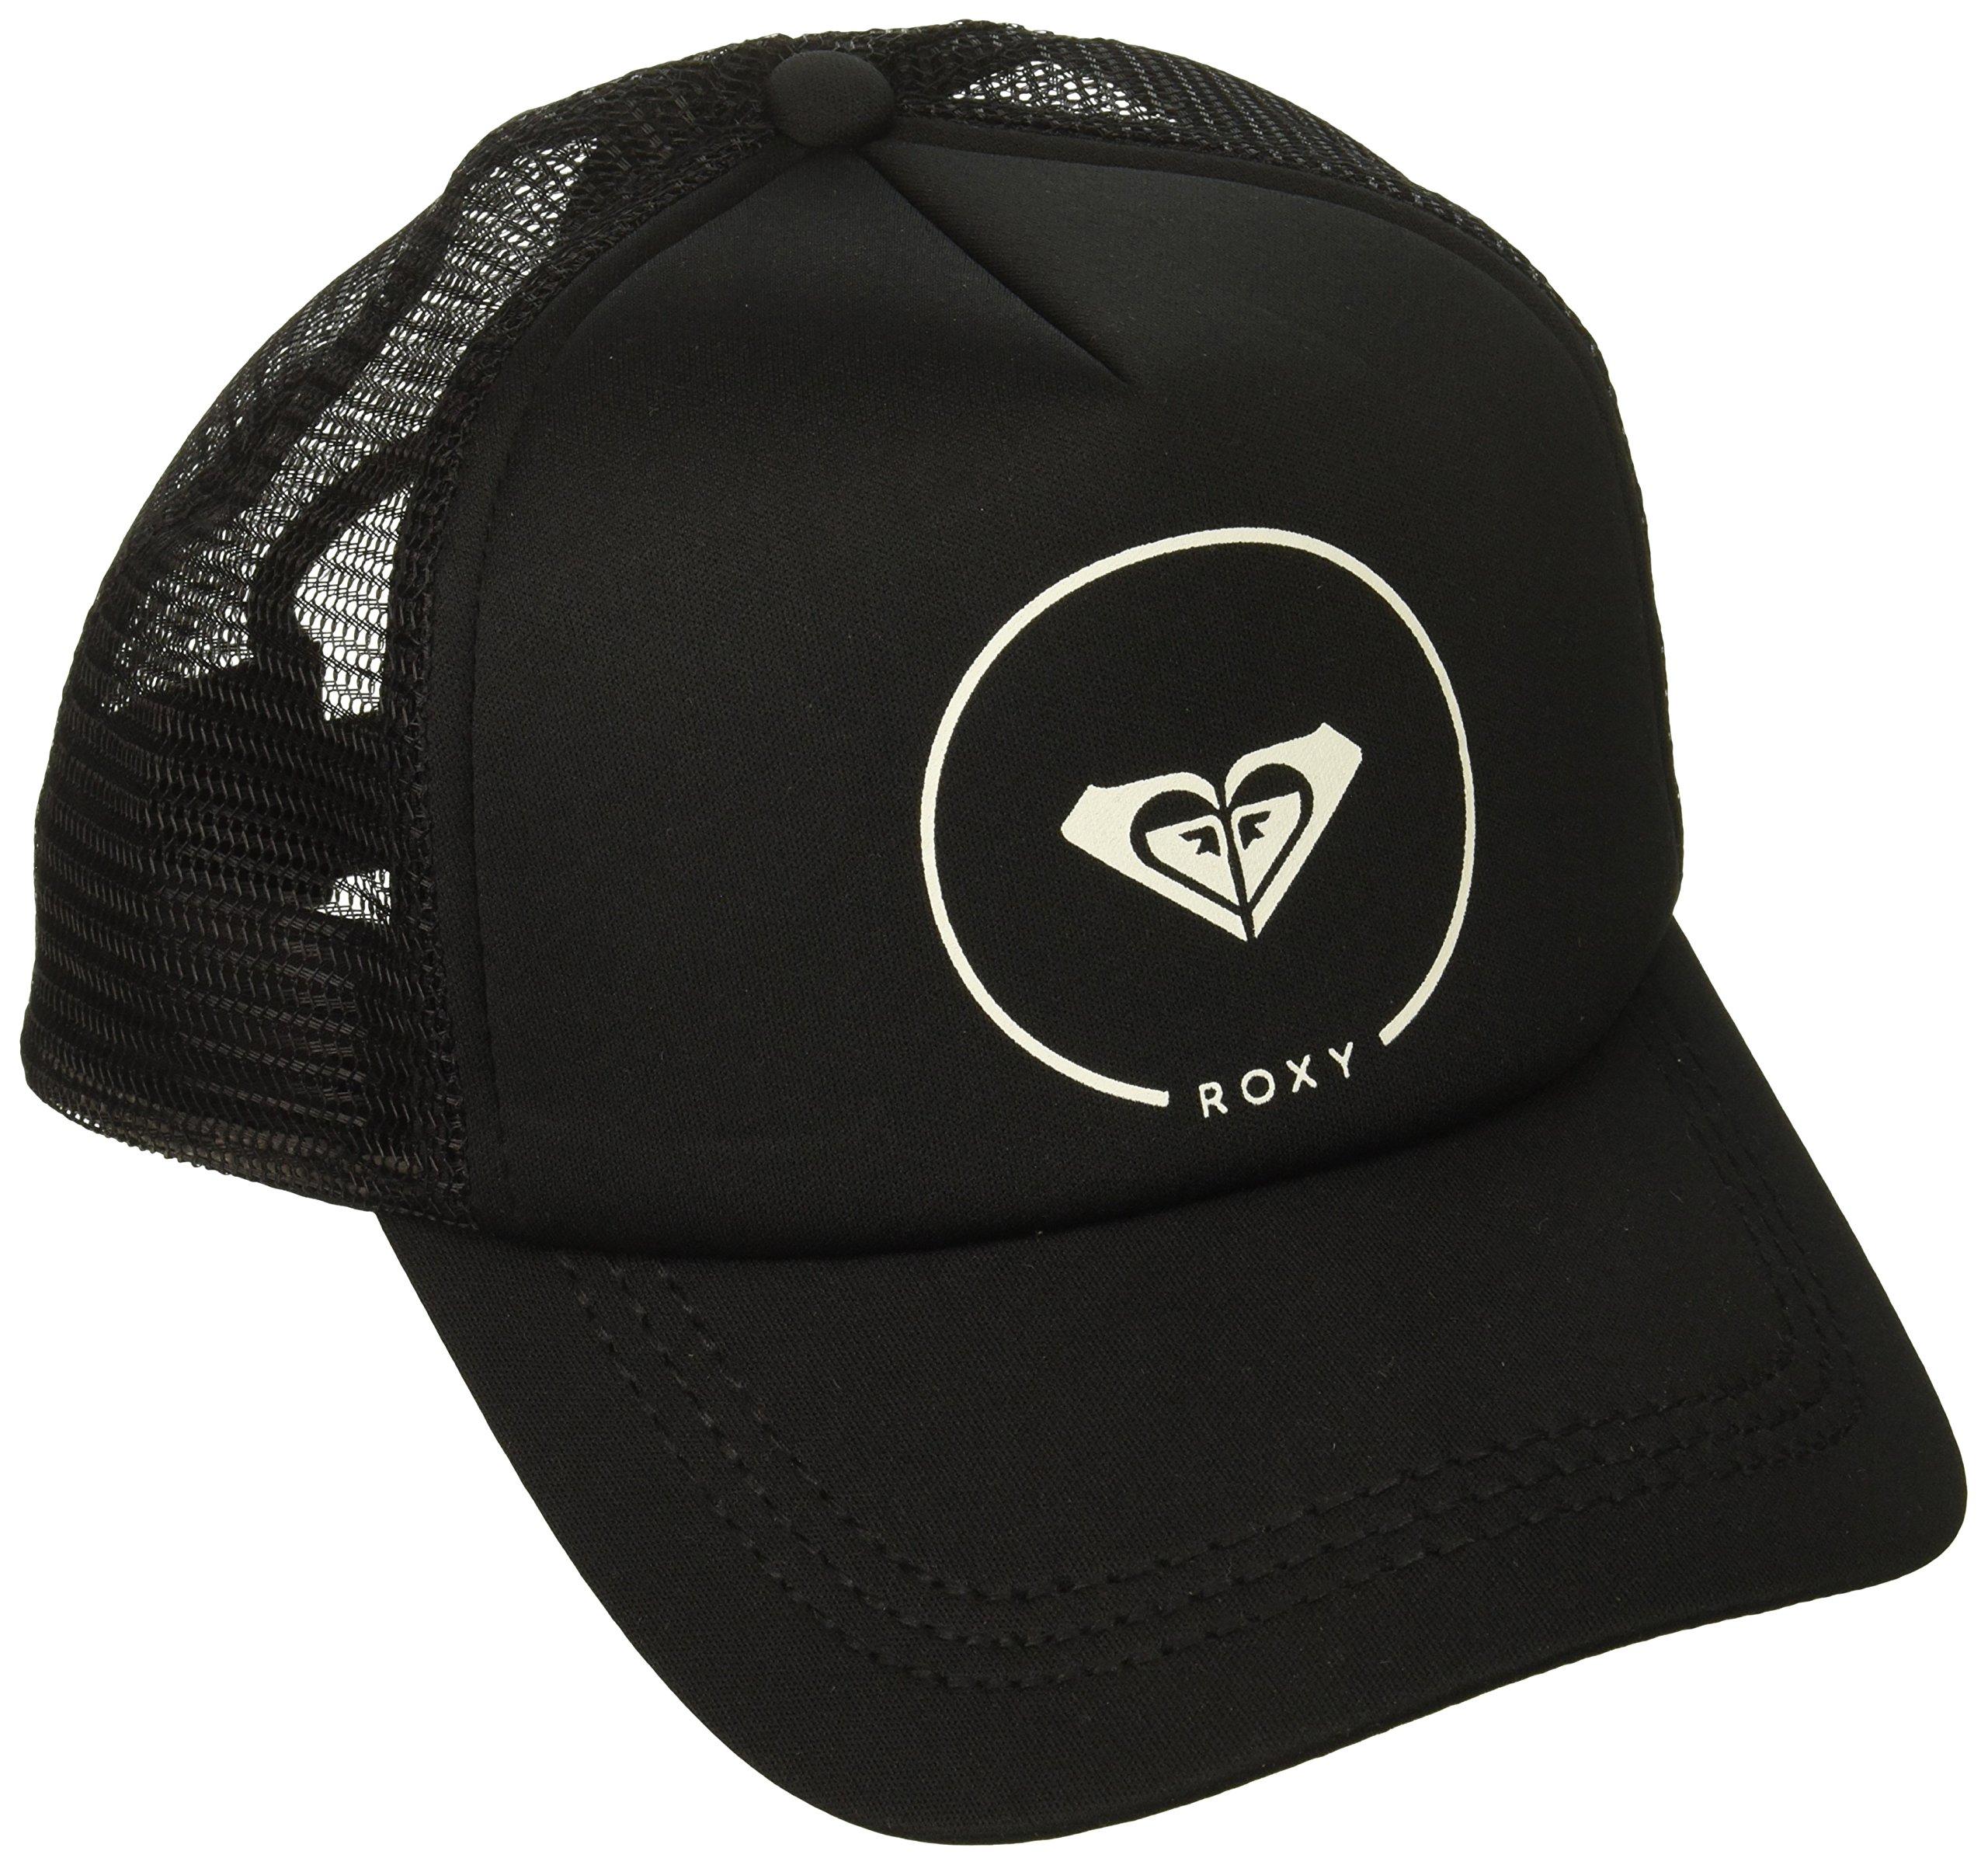 Roxy Women's Truckin Trucker Hat, Black Anthracite, 1SZ